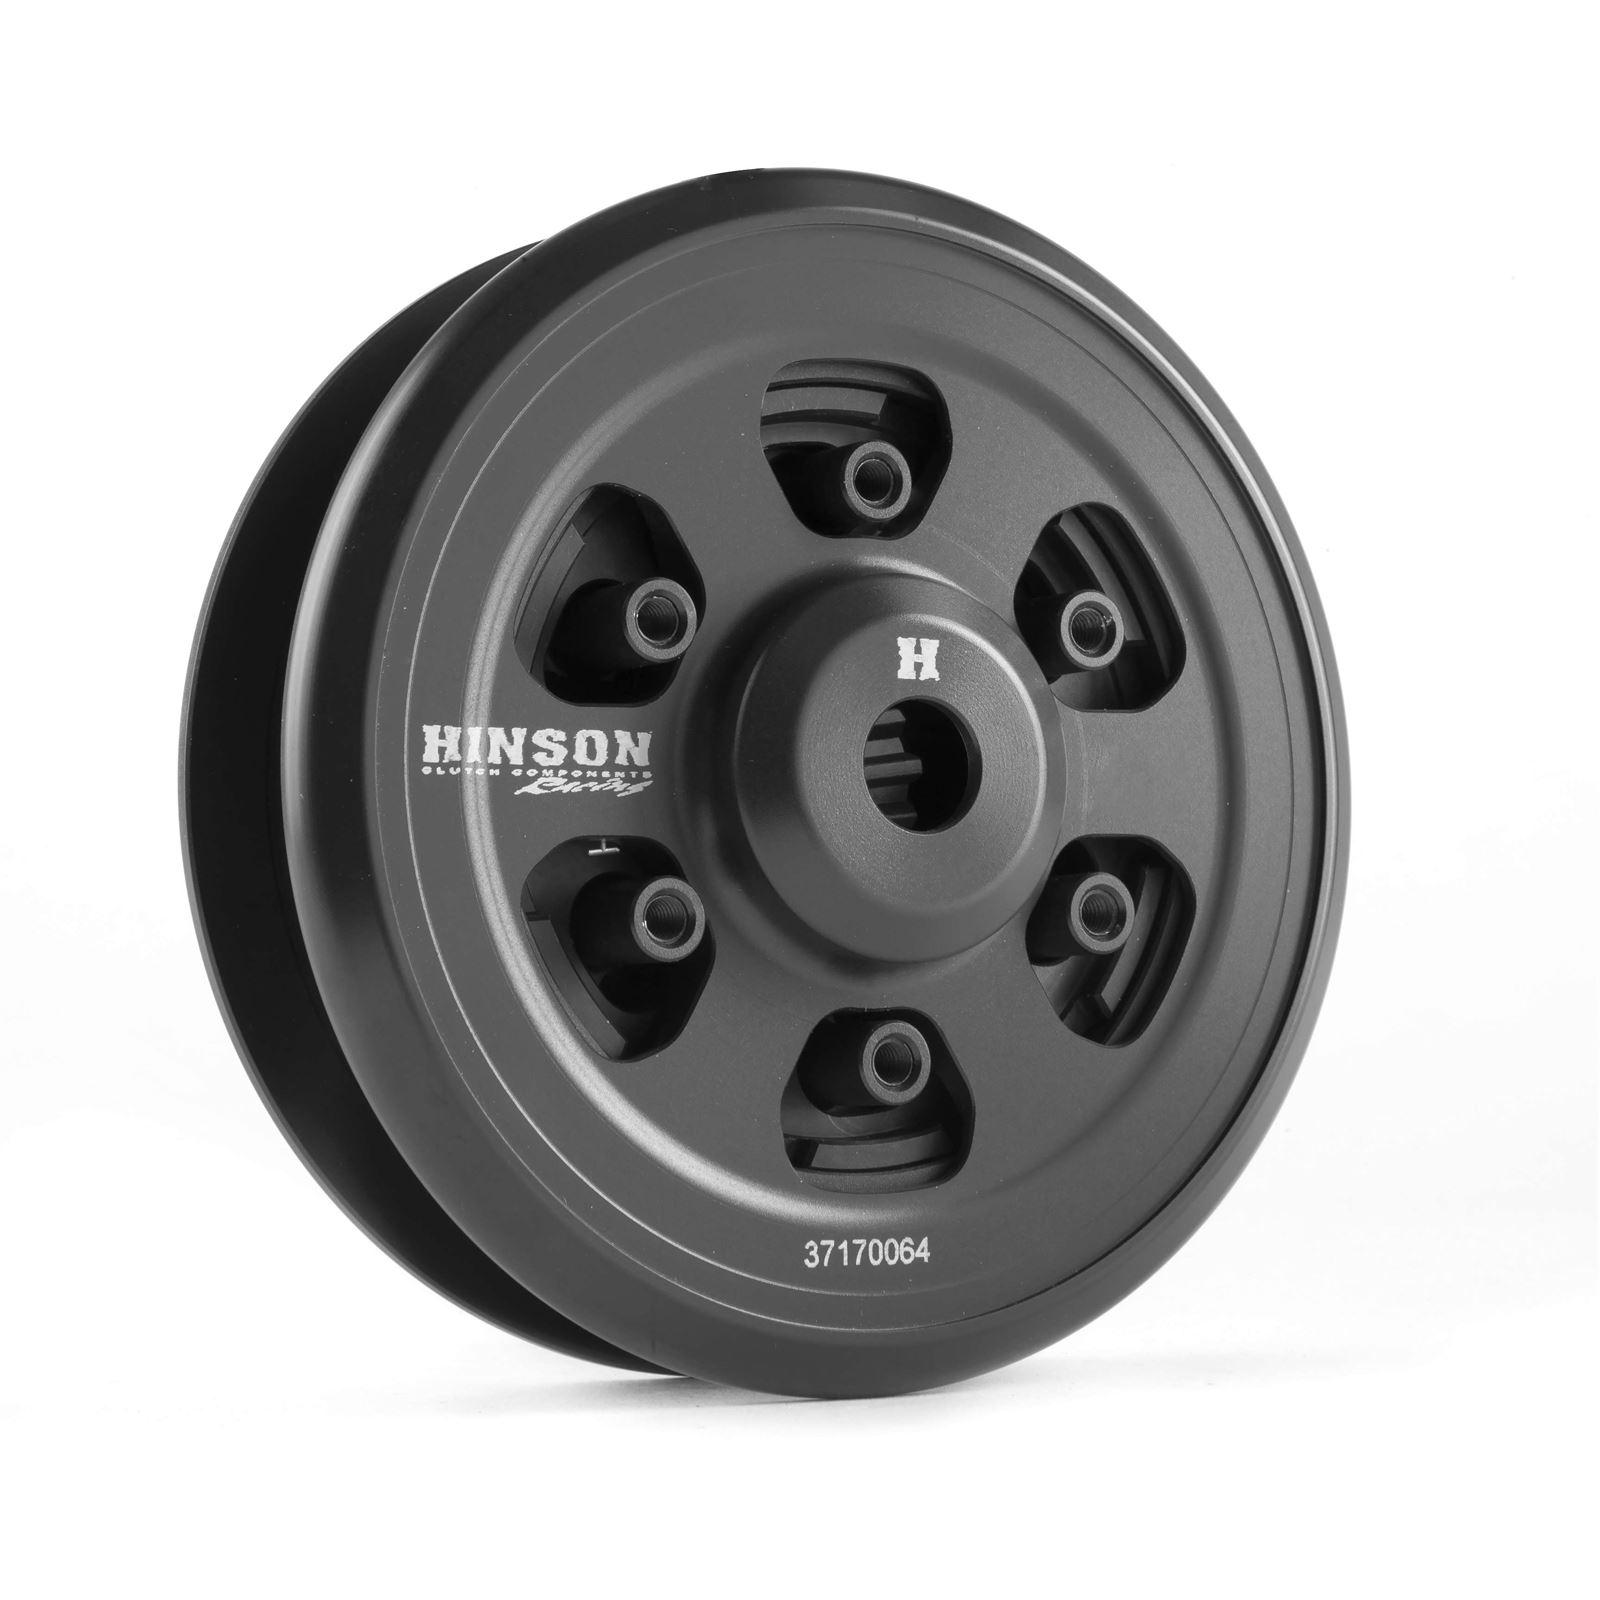 Hinson High Performance Pressure Plate/Inner Hub